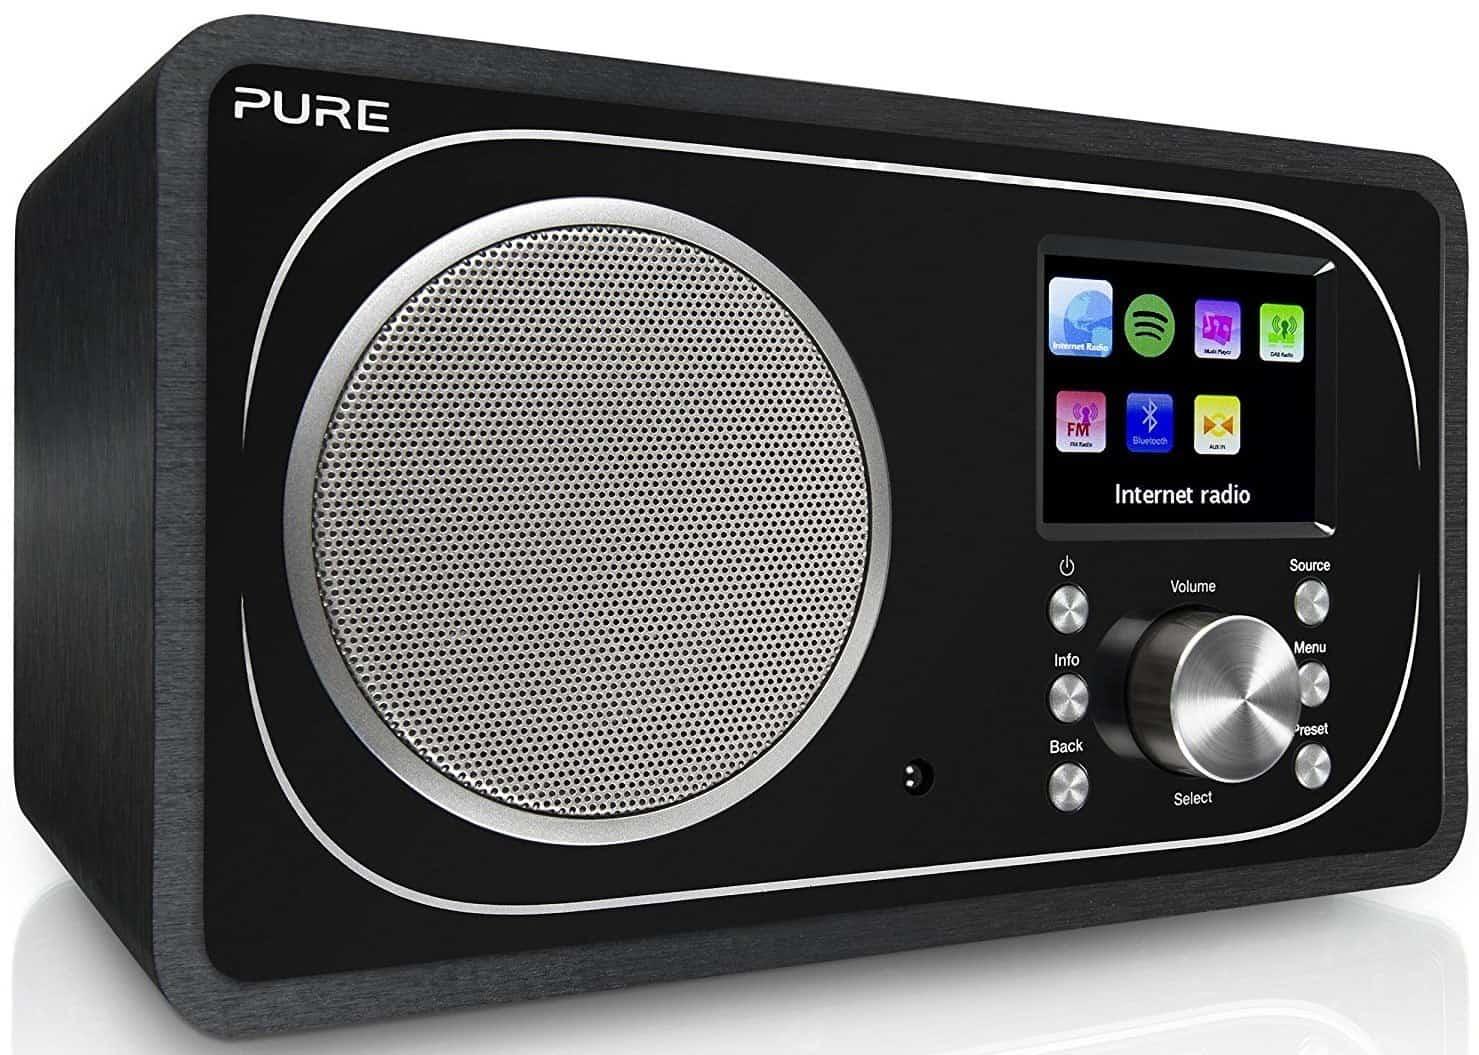 Best DAB Internet Radio – Pure